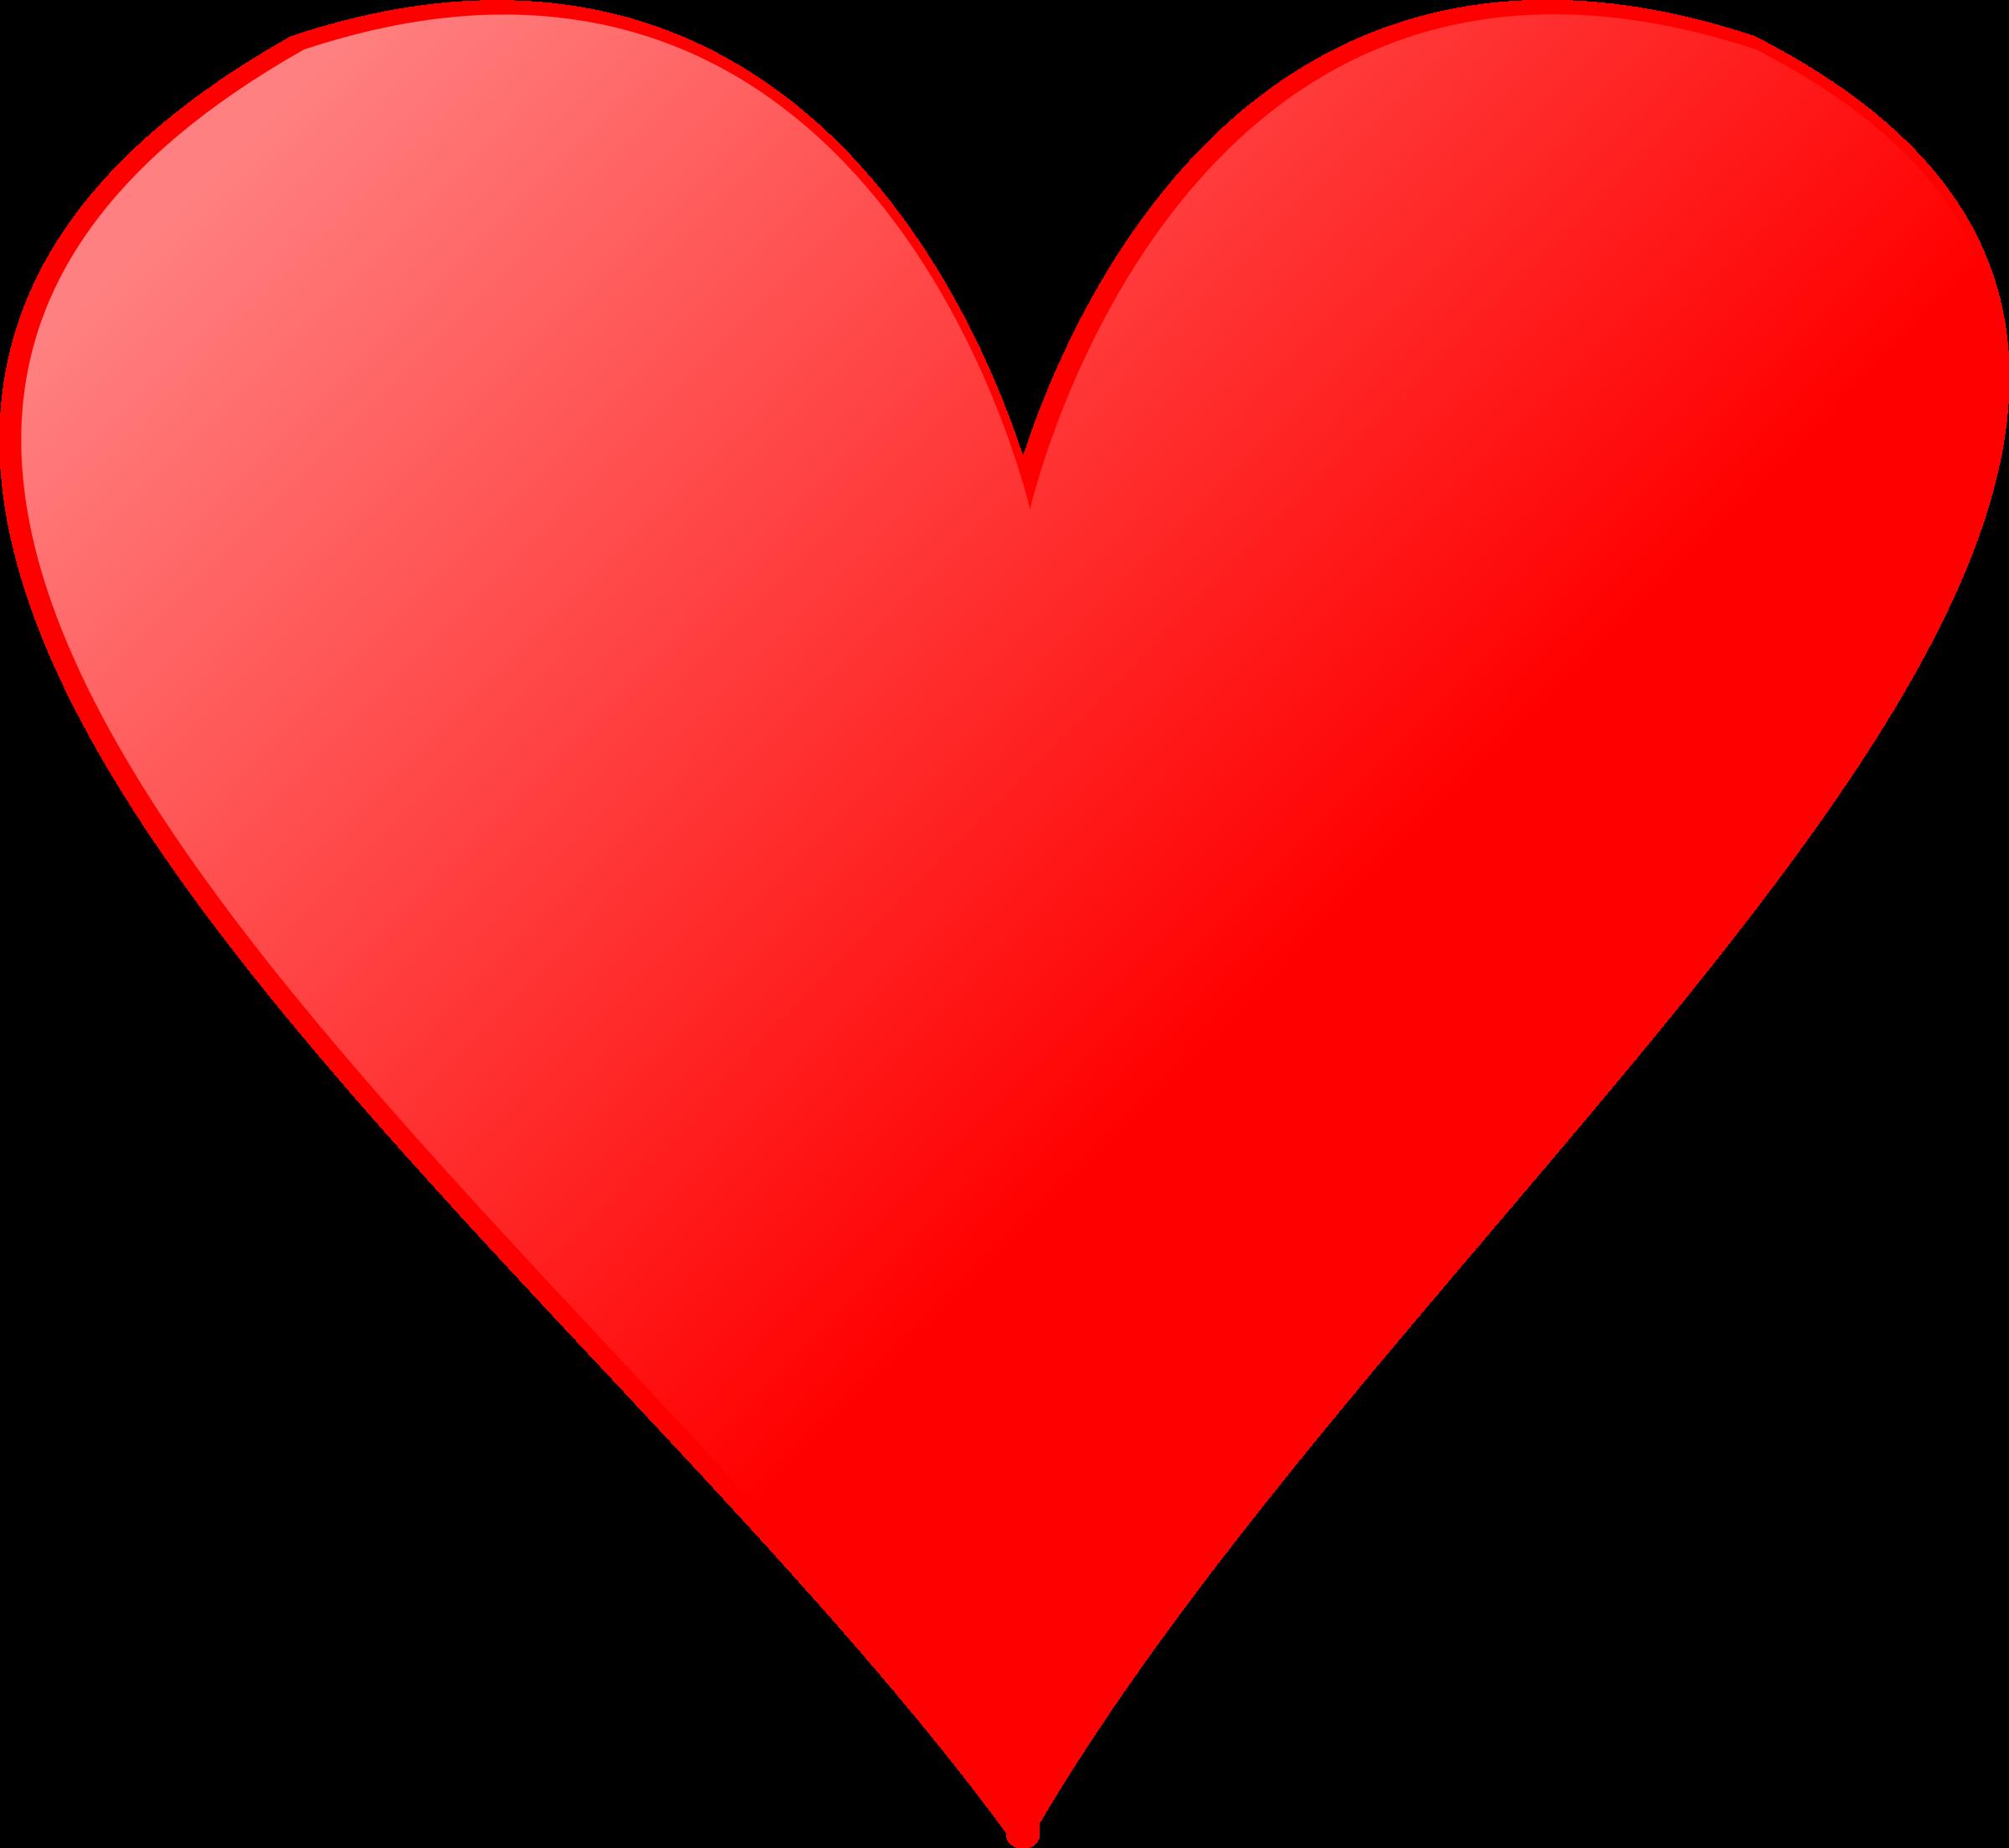 Card clipart valentine's day Heart Card symbols: symbols: Heart